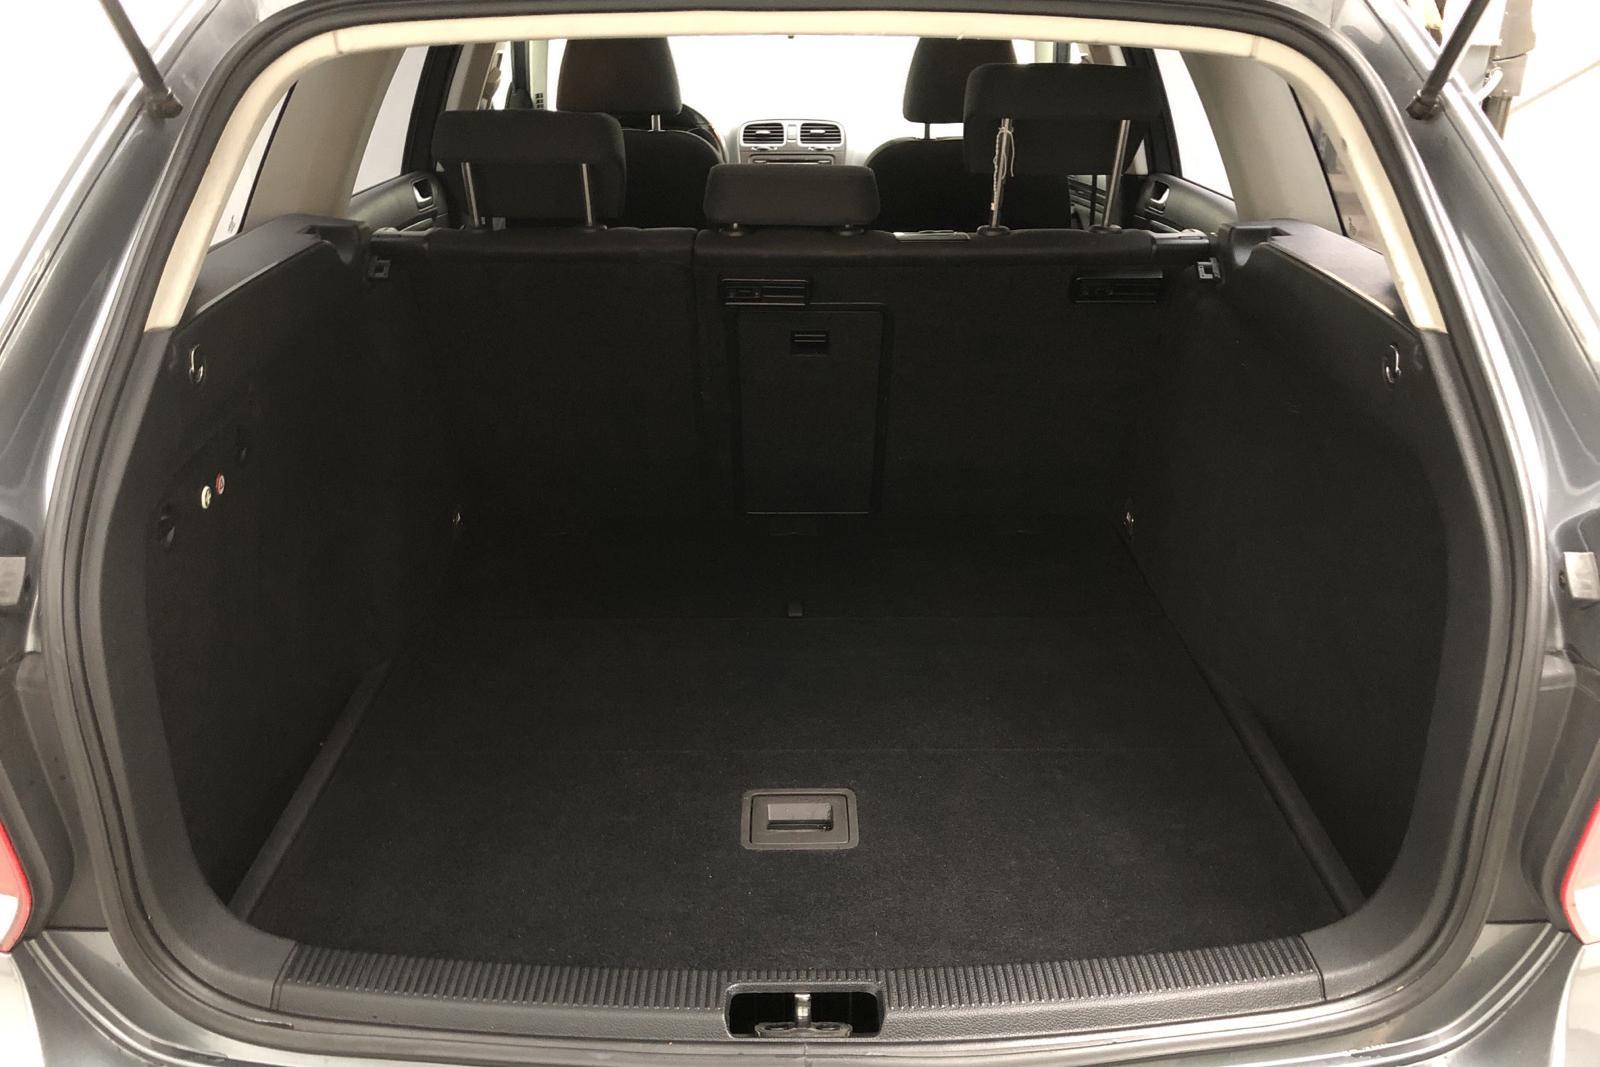 VW Golf VI 1.4 TSI Variant (122hk) - 0 km - Manual - Dark Grey - 2010